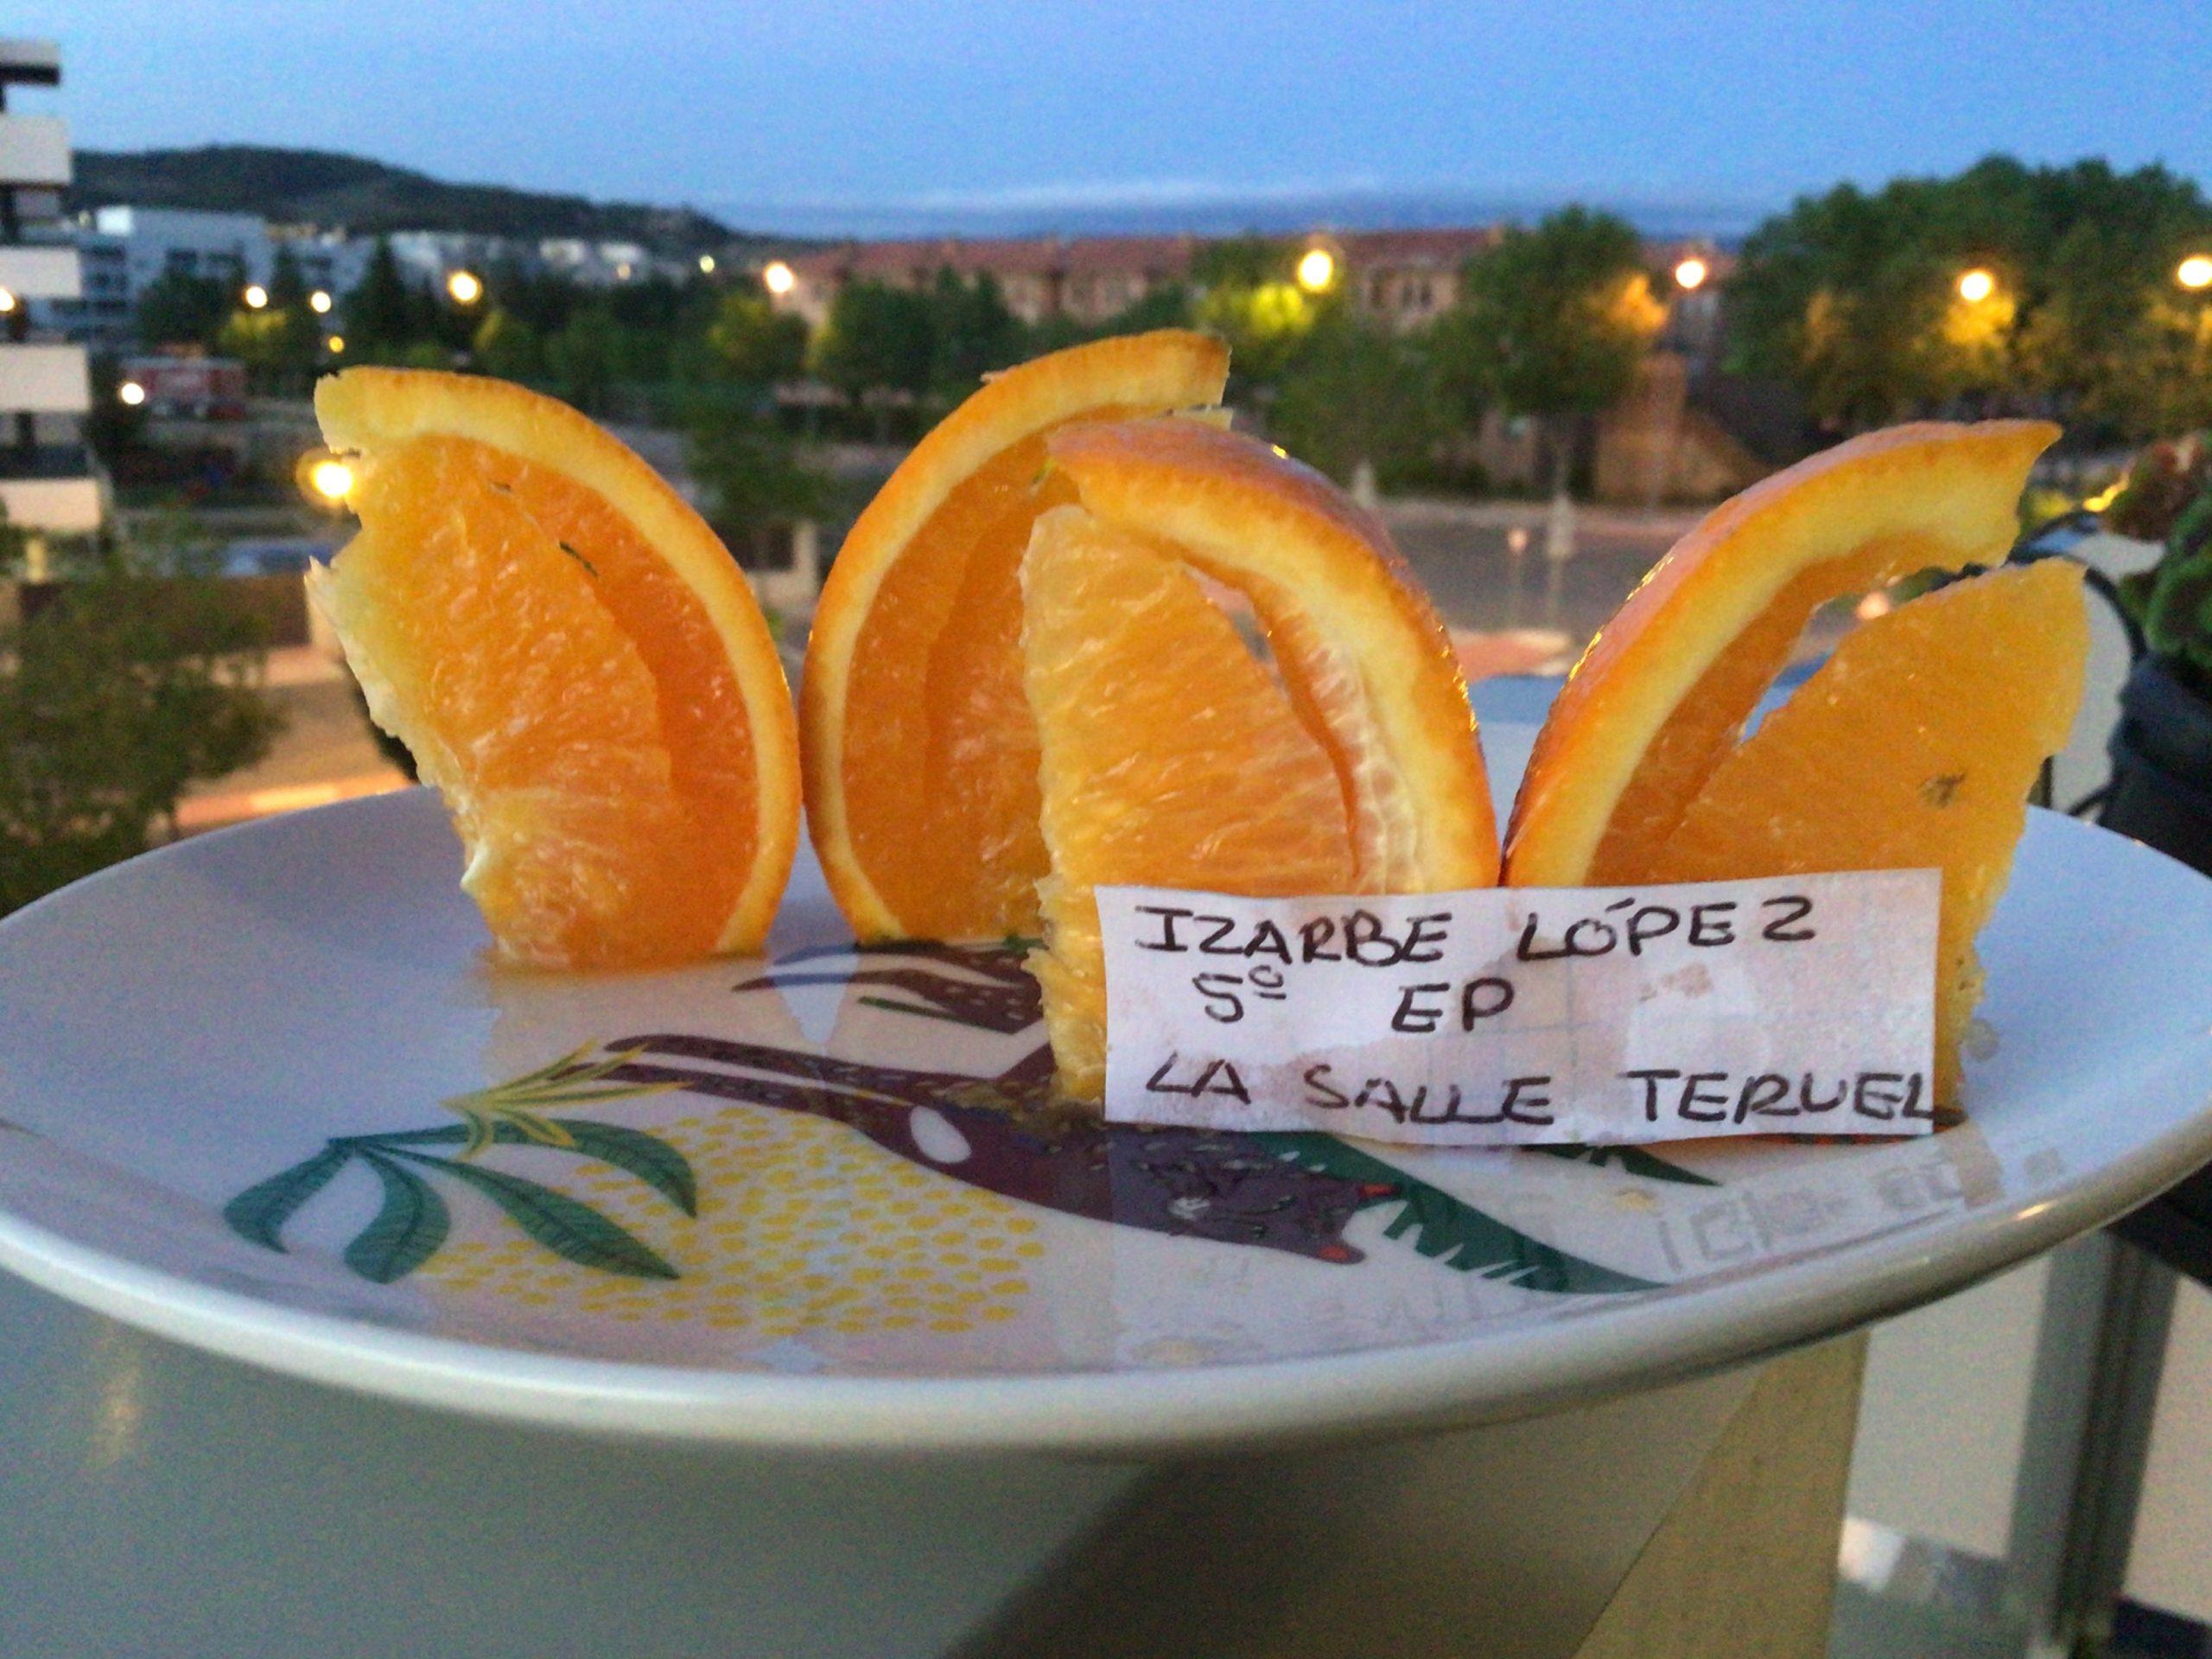 Izarbe La Salle Teruel 0113